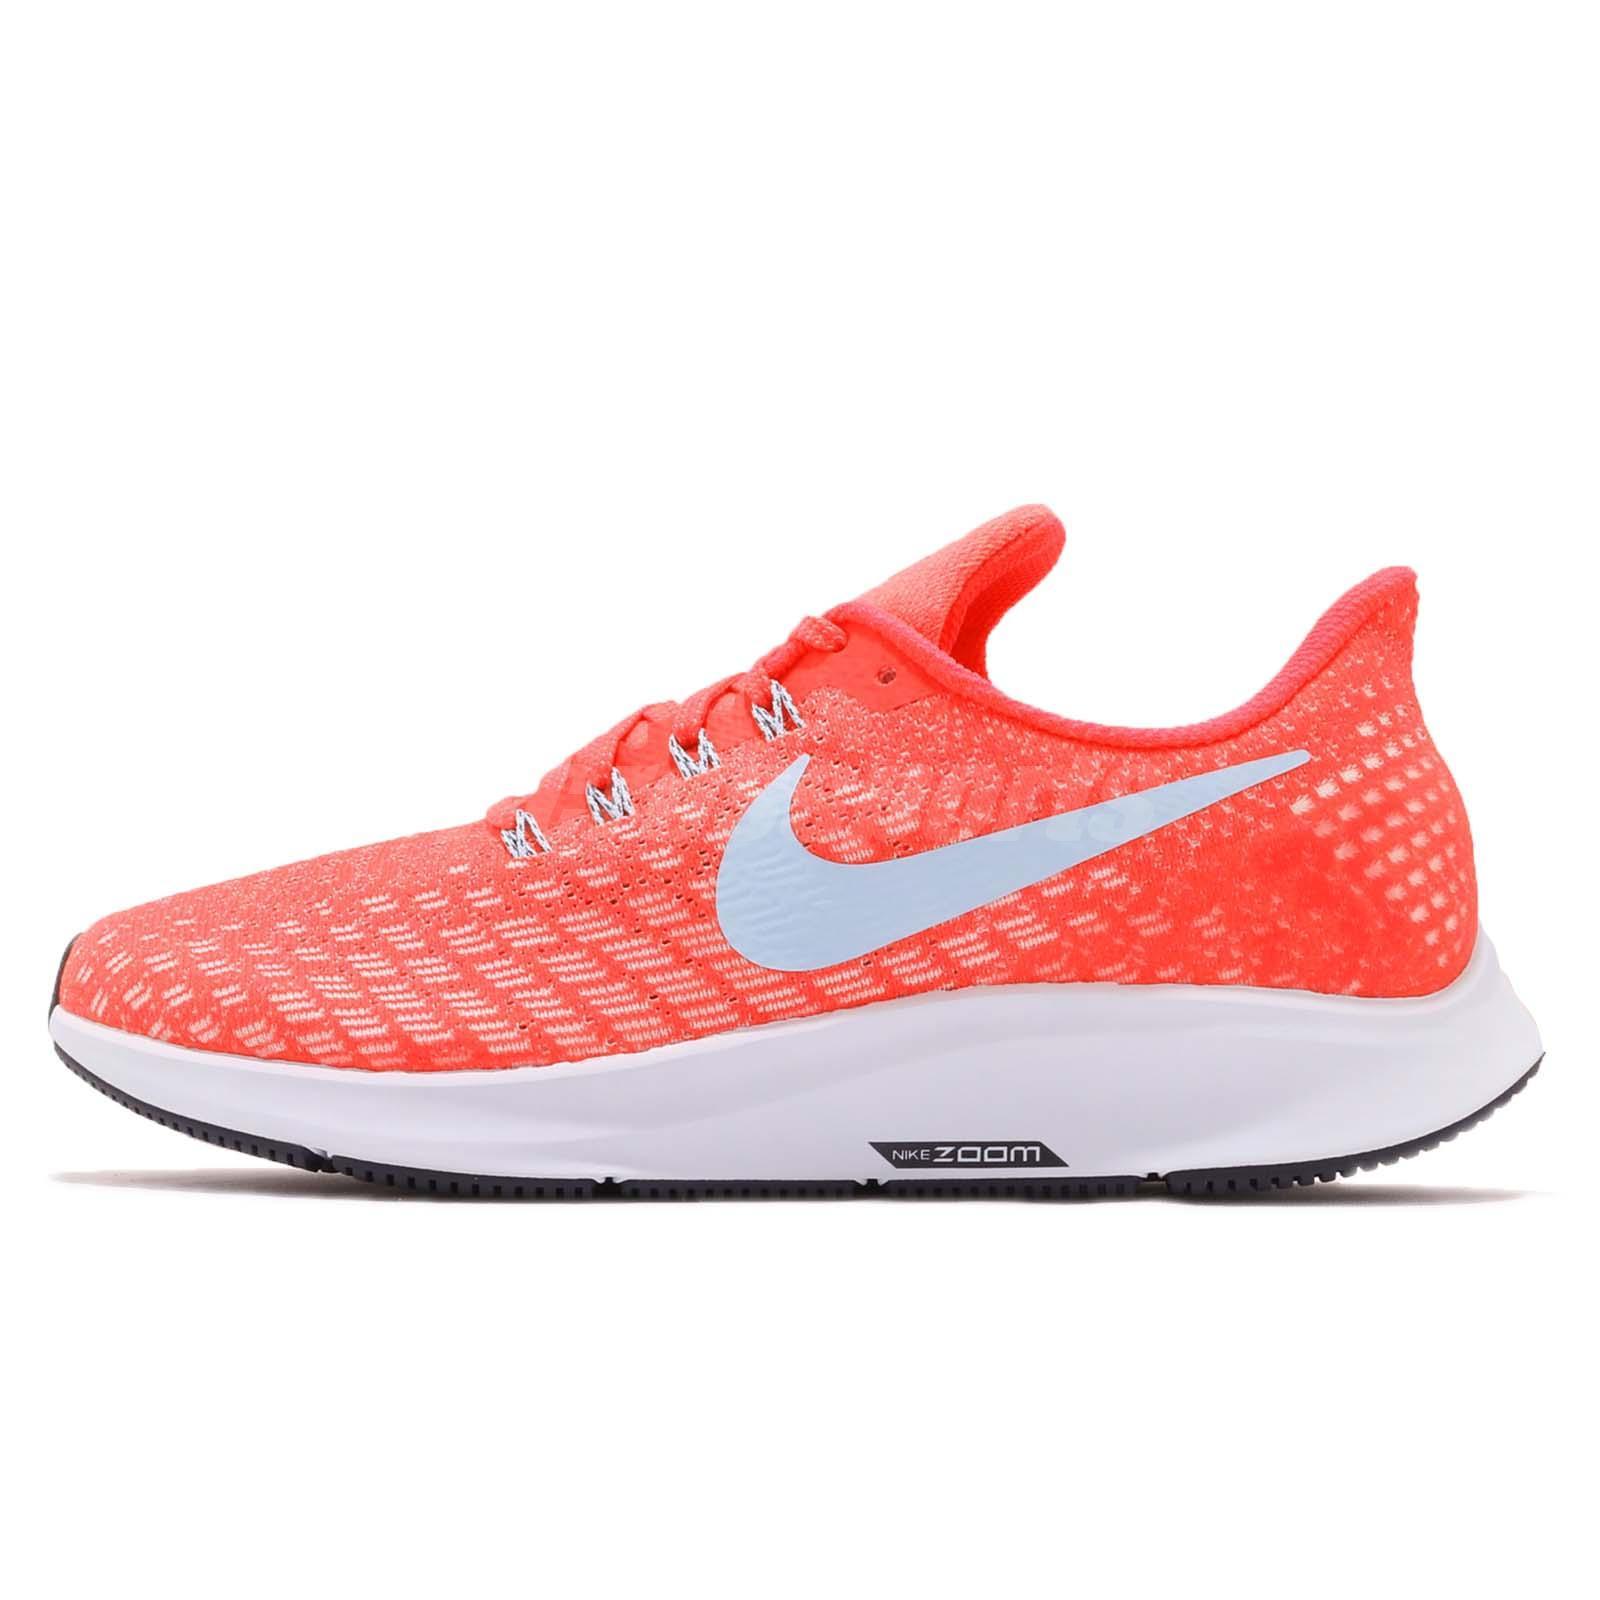 72c8ae5fb Nike Wmns Air Zoom Pegasus 35 Bright Crimson Ice Blue Sail Women Shoe 942855 -600